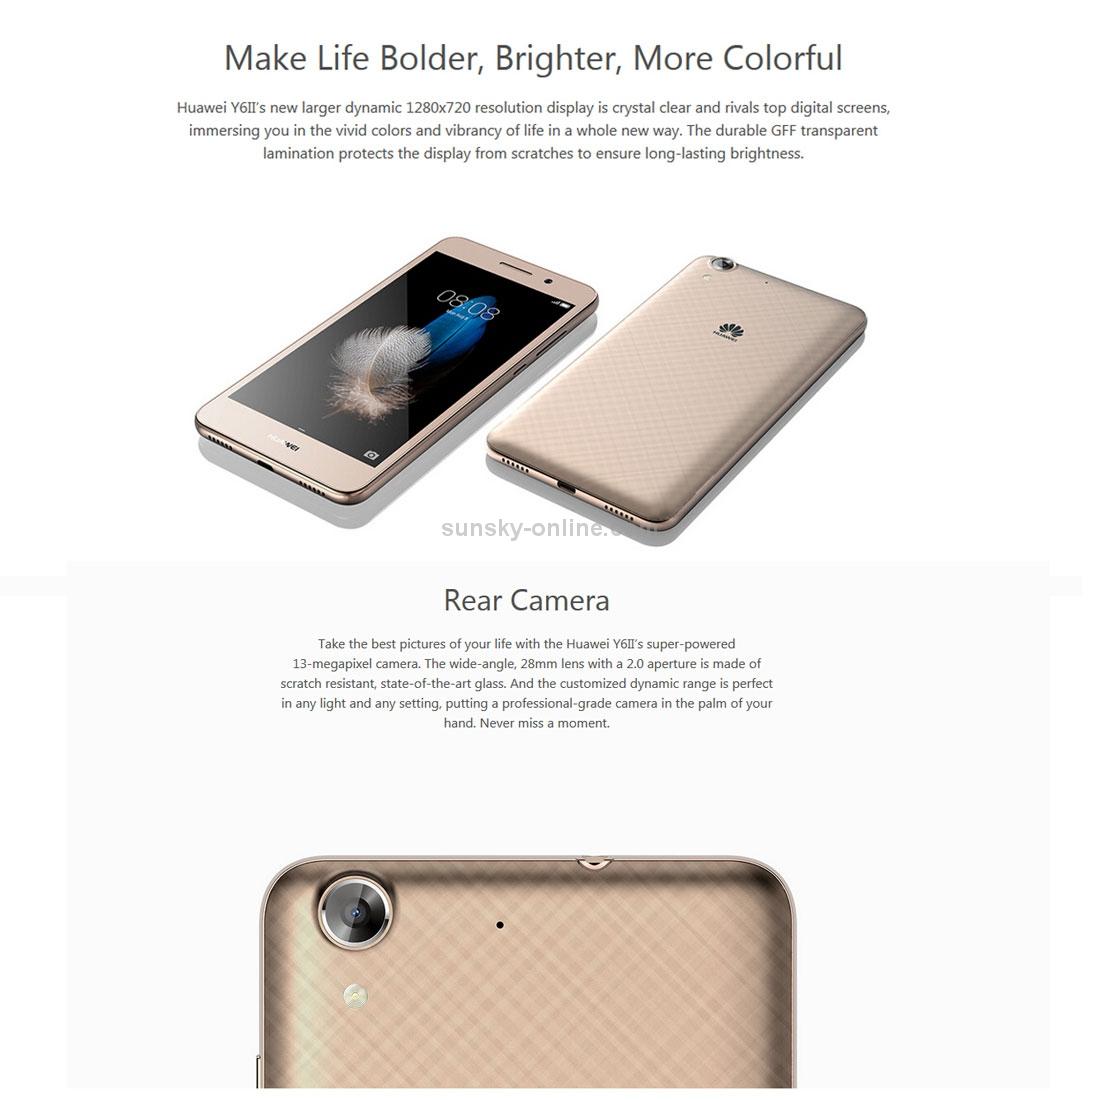 SUNSKY - Huawei Y6 II, 2GB+16GB, China Version, Dual Camera